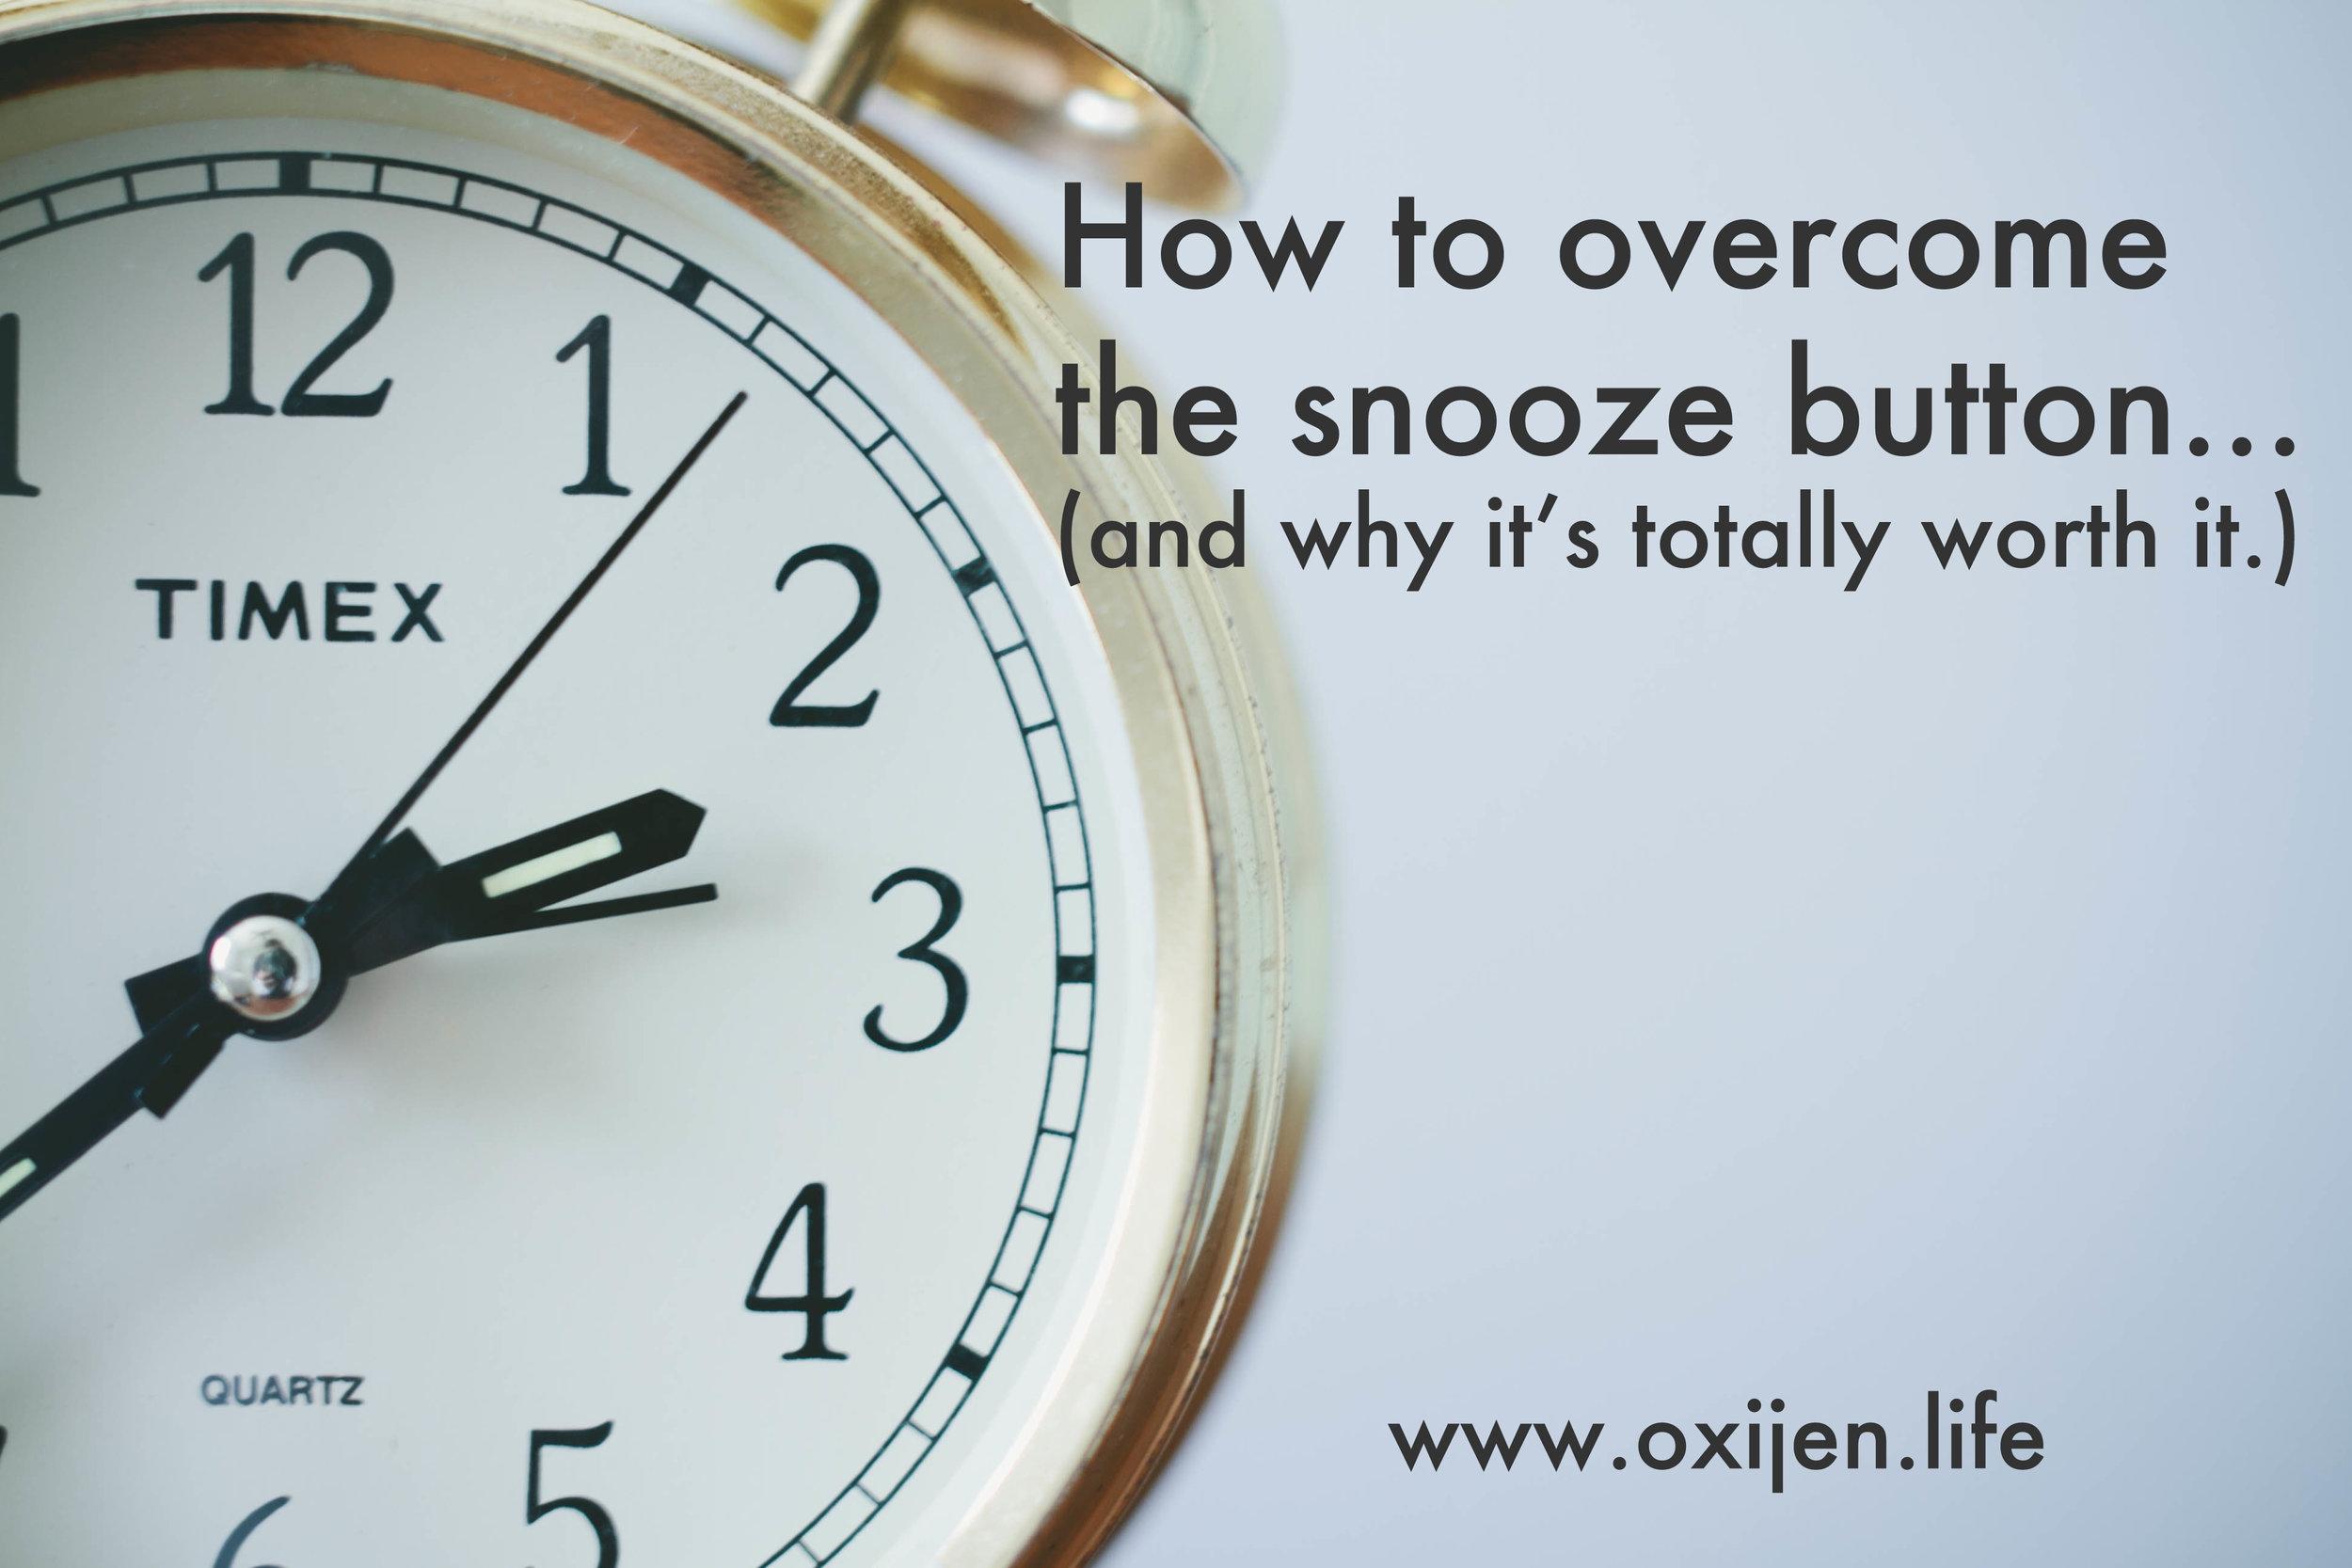 Oxijen_blog-Snooze_6-20-19.jpg